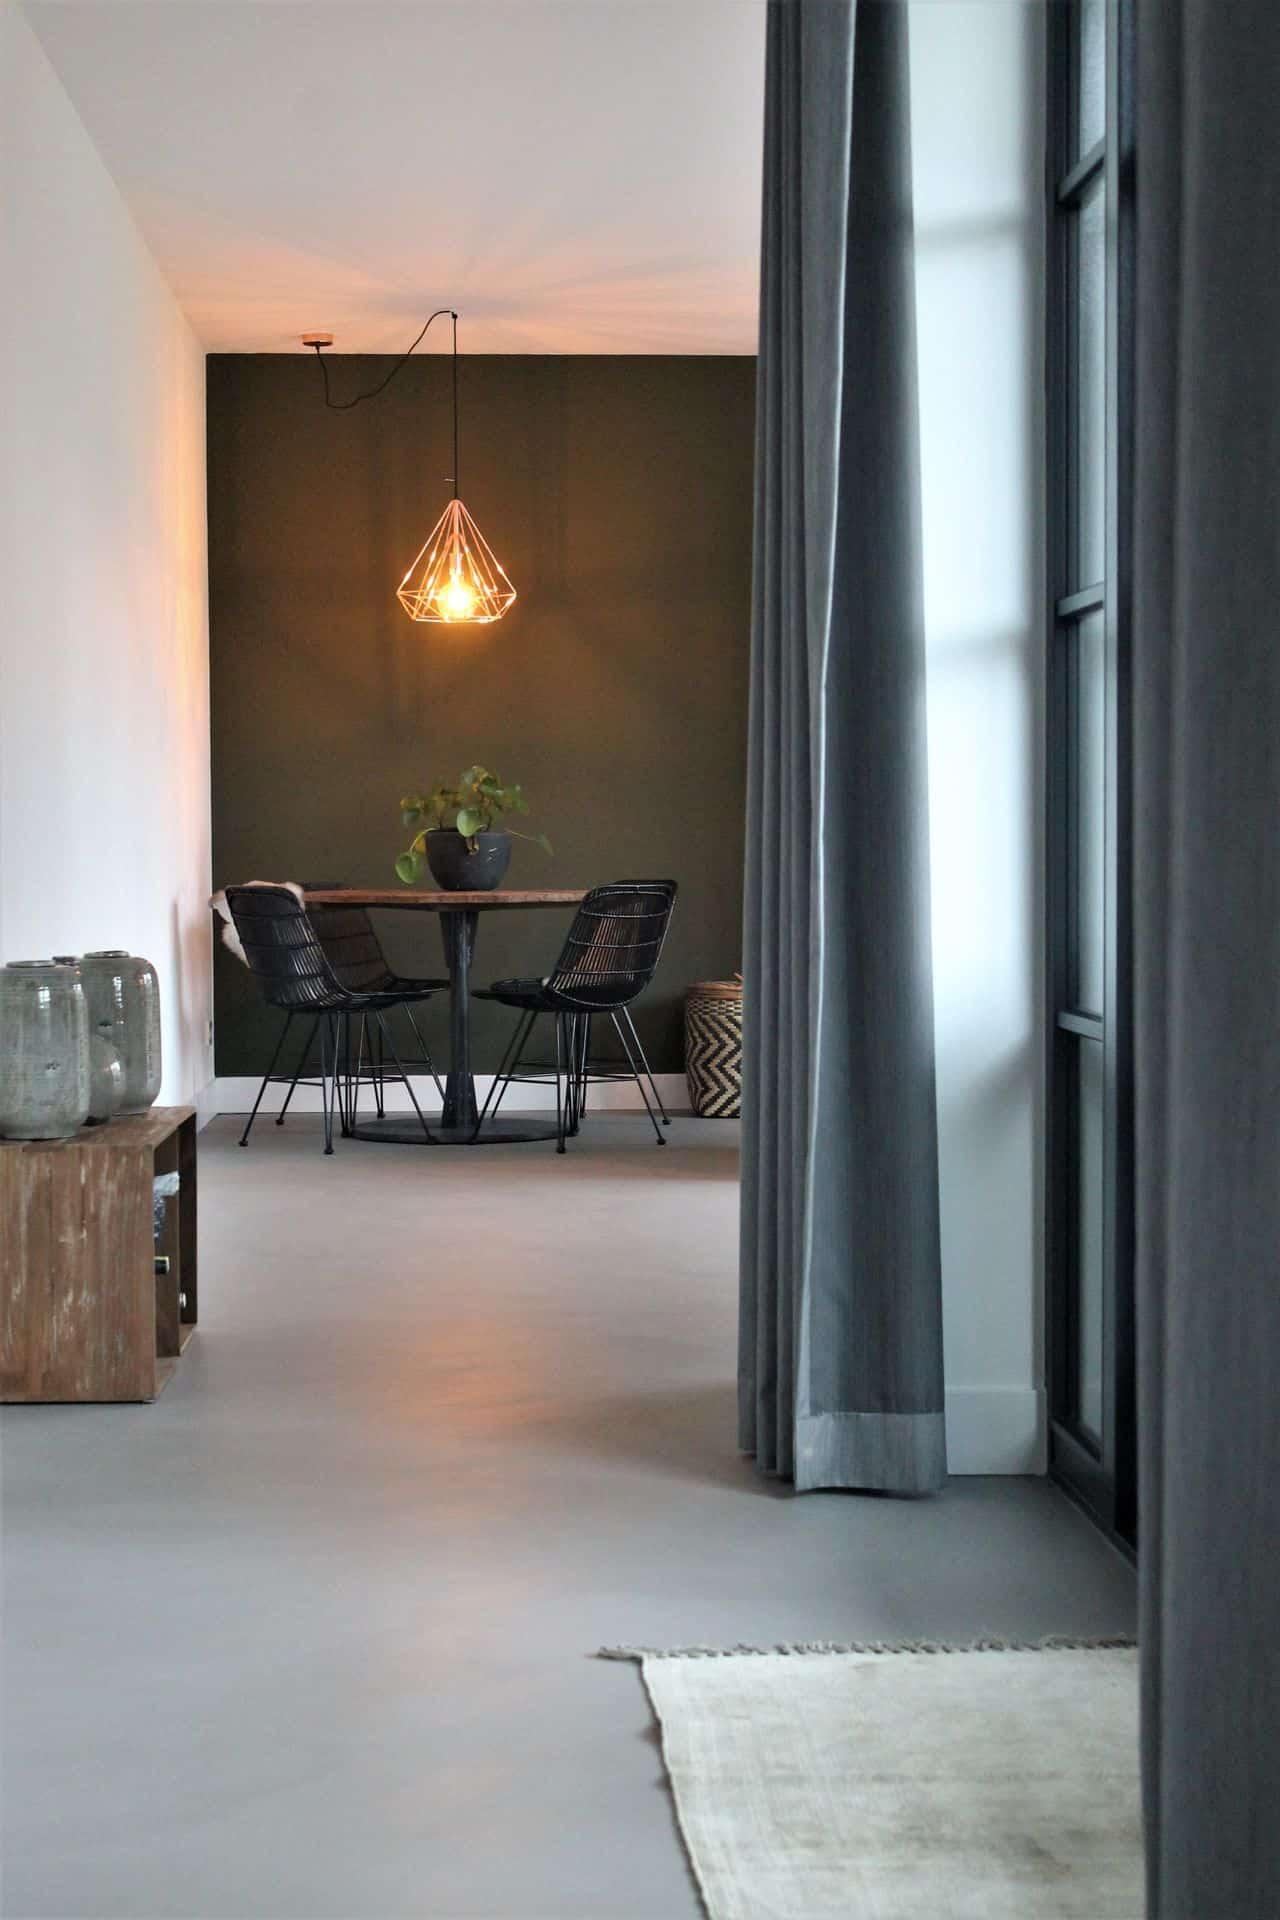 beton ciré prijzen, beton ciré vloer in huis